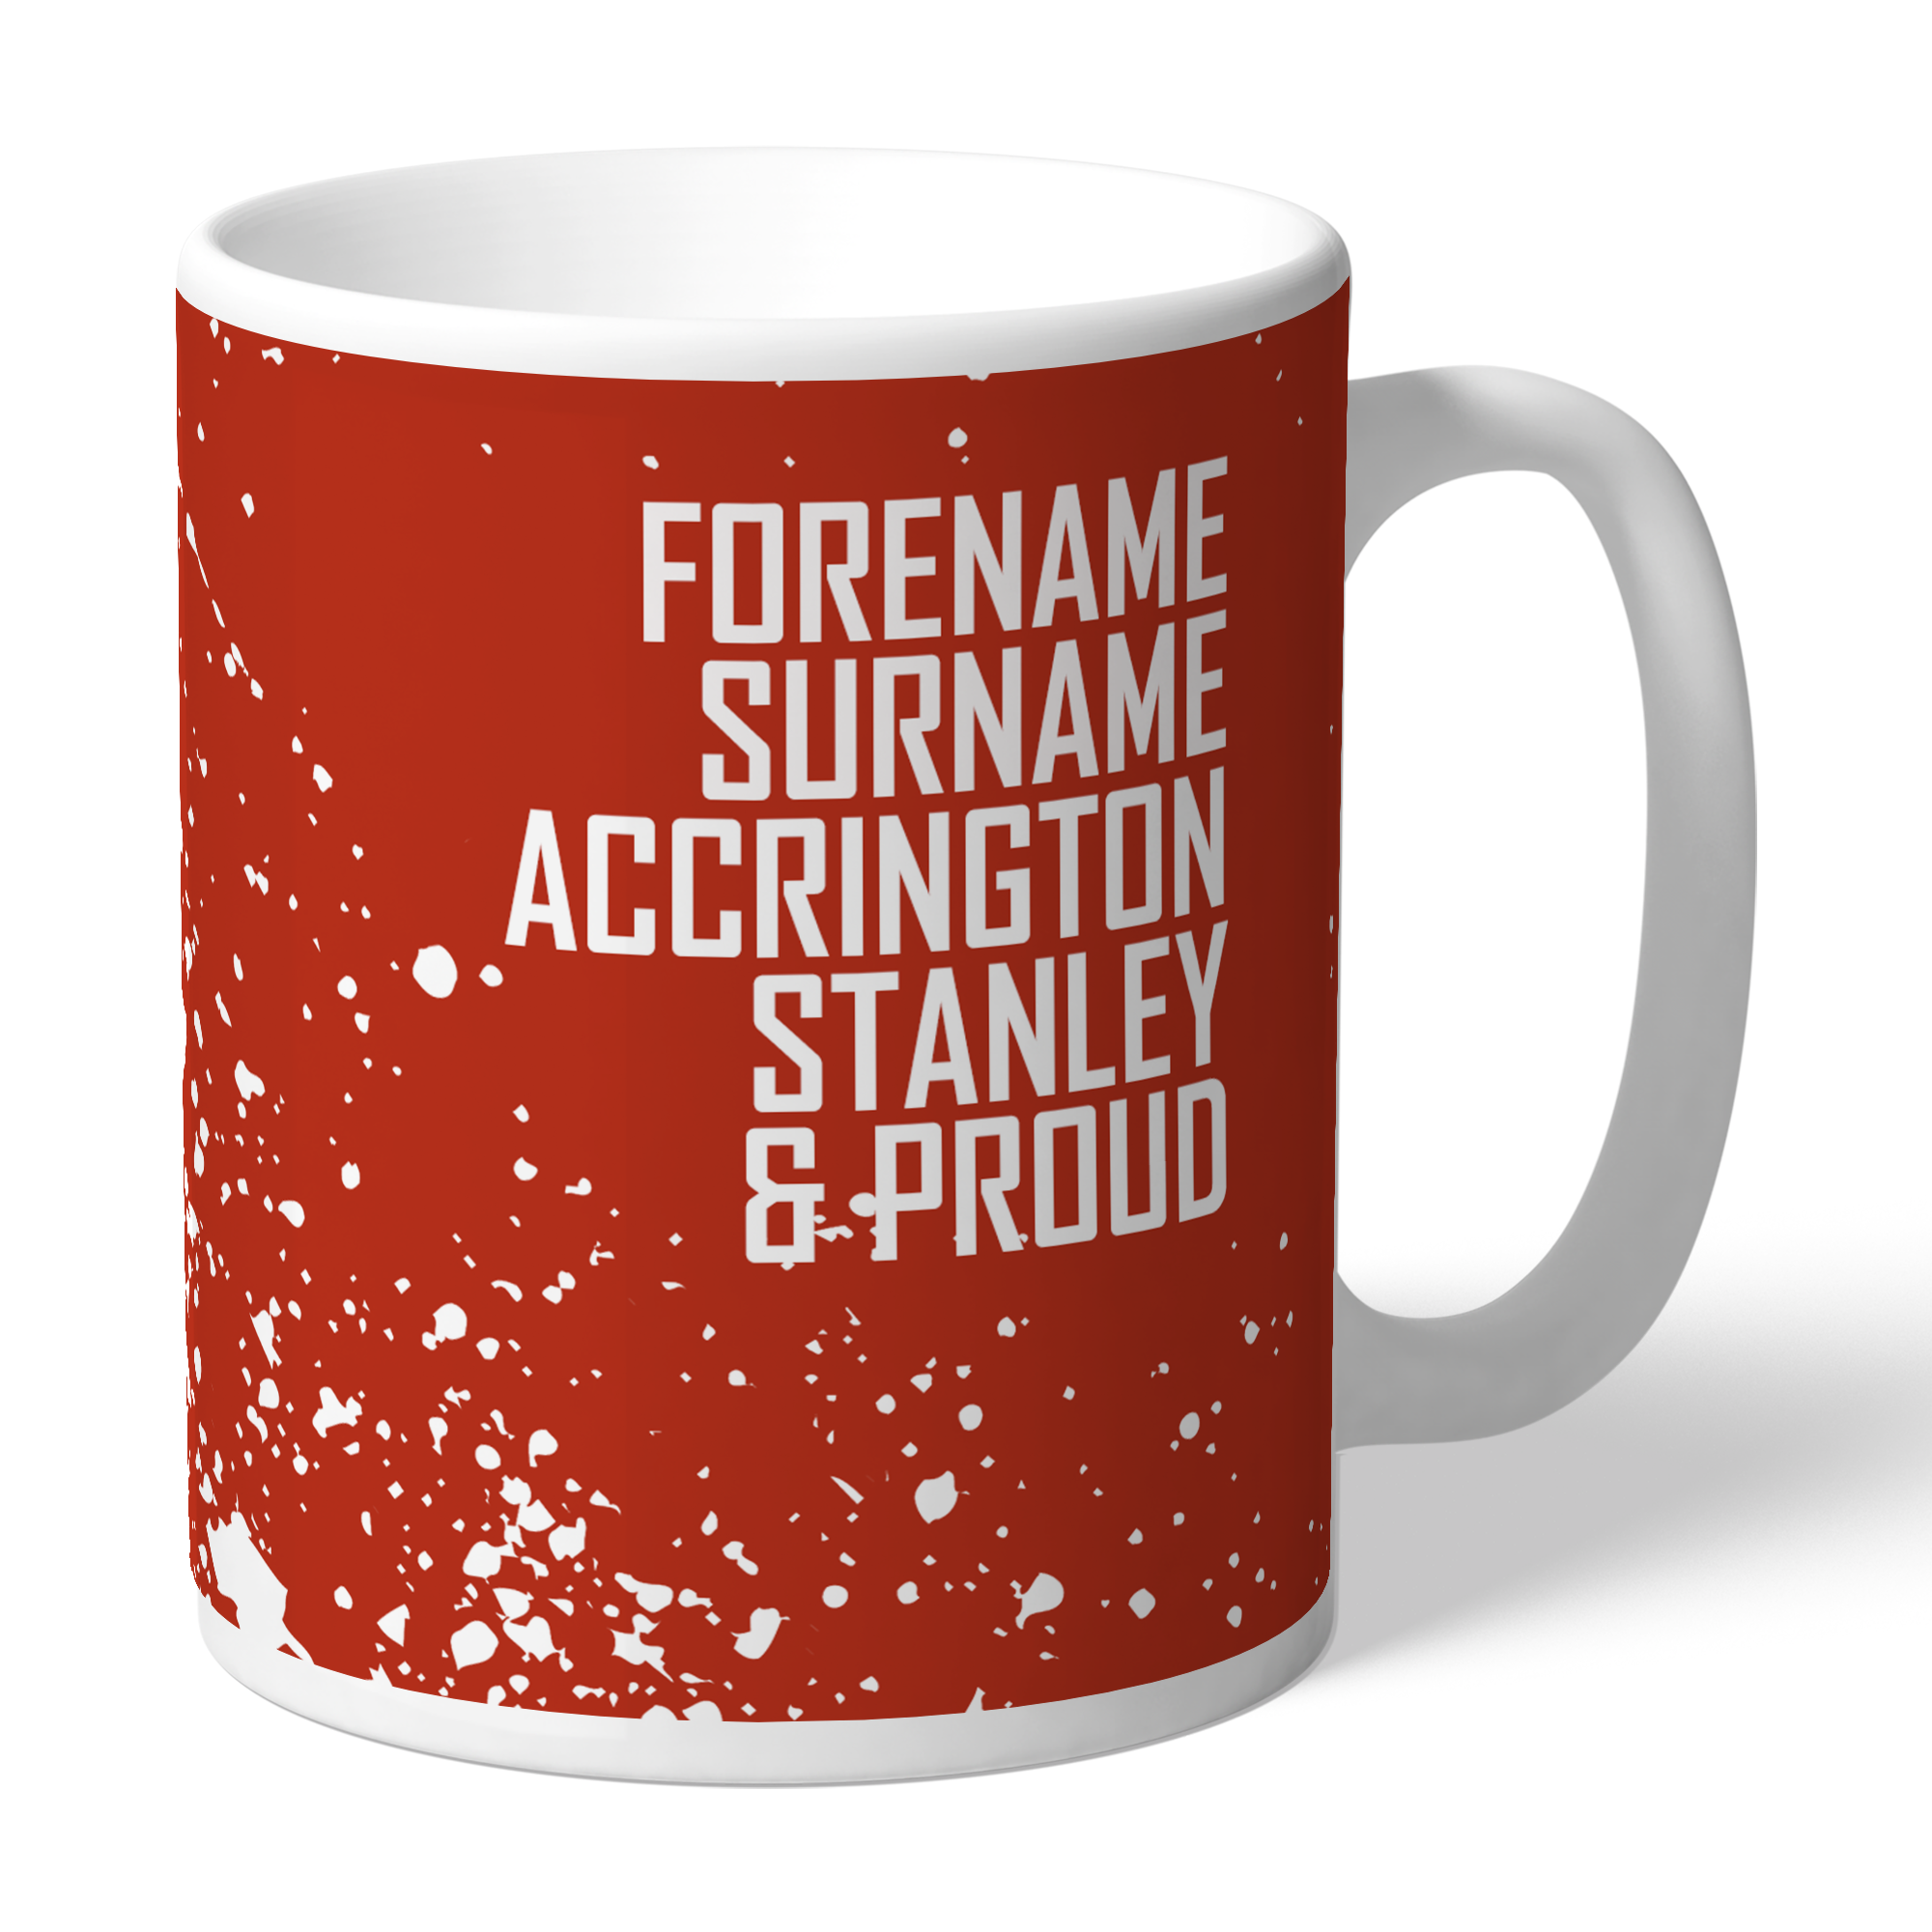 Accrington Stanley Proud Mug